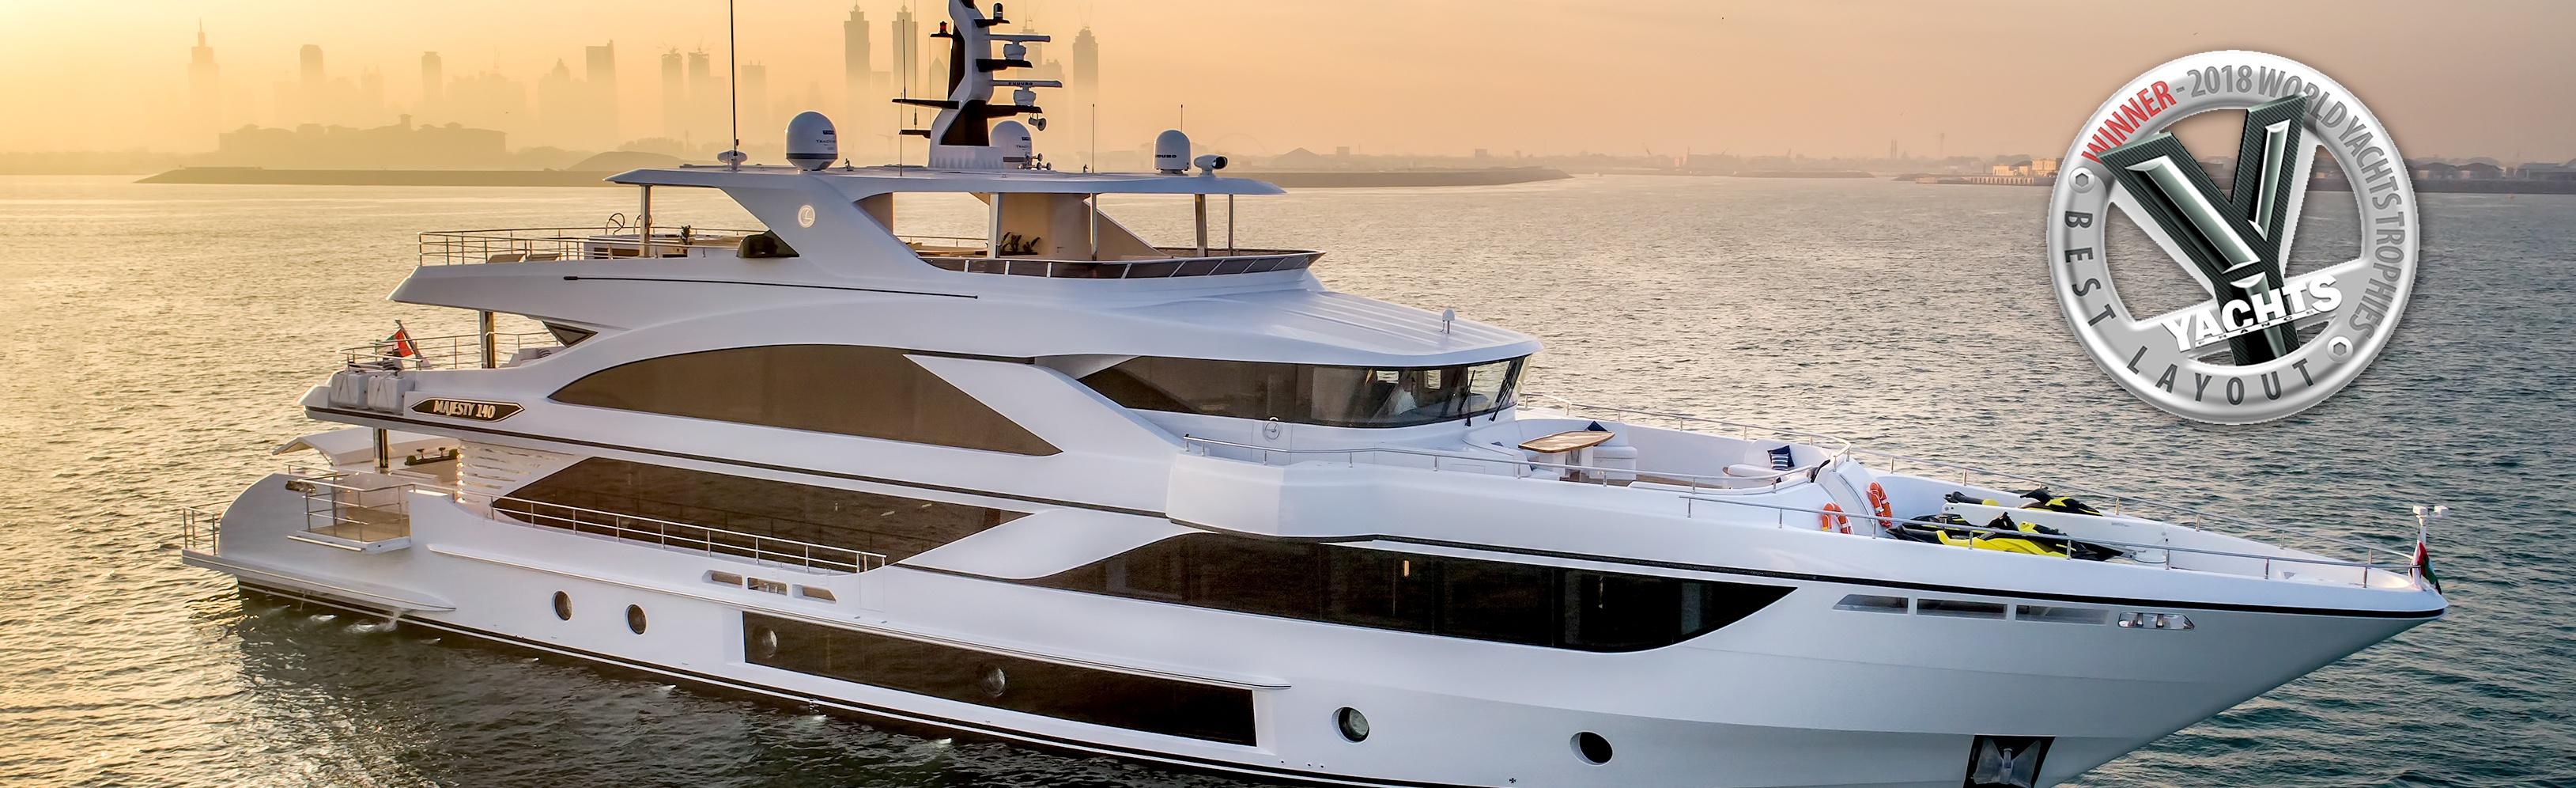 Majesty-140-award,-World-Yachts-Trophies-2018